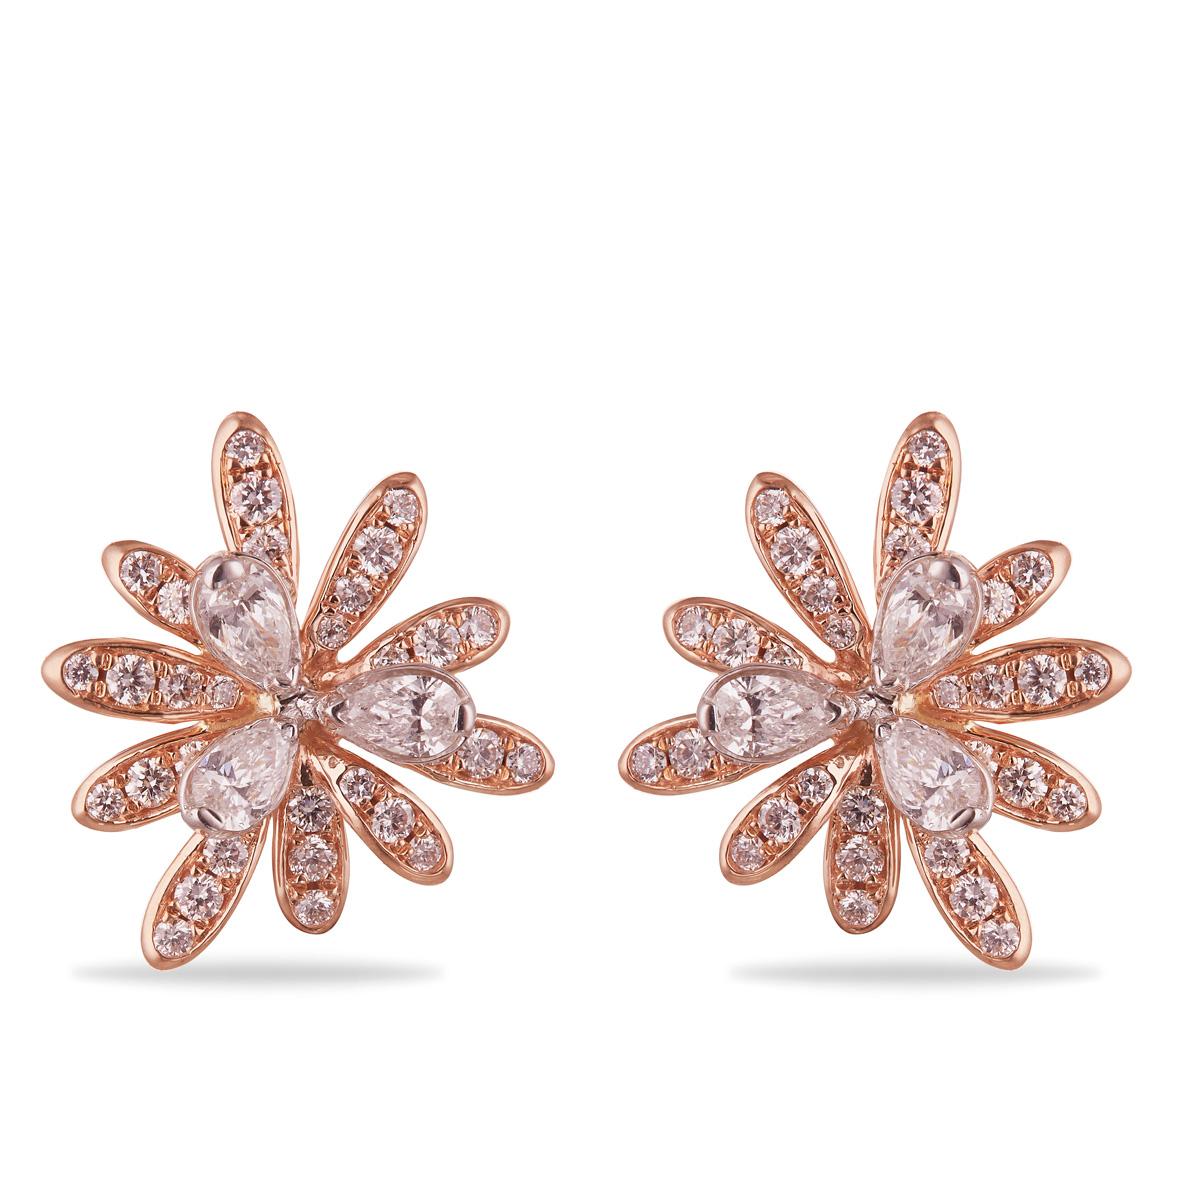 Brushed Floral Earrings